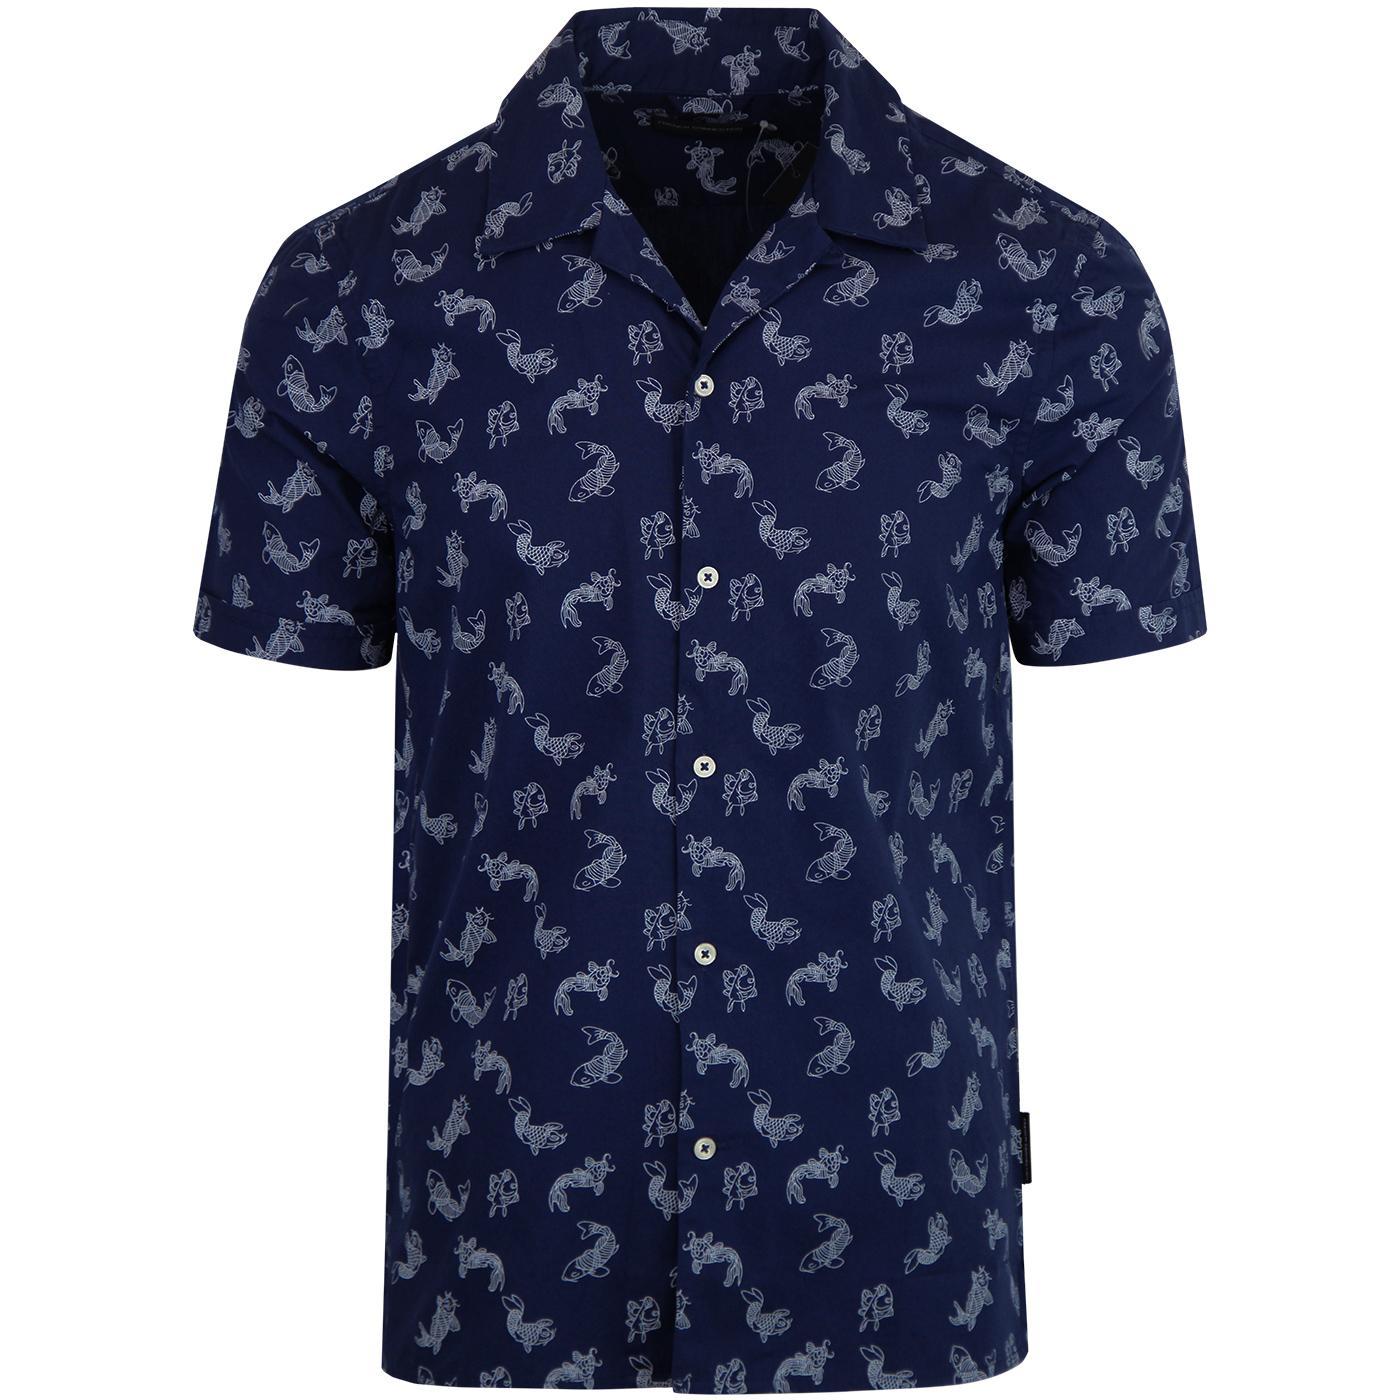 FRENCH CONNECTION 70s Koi Carp Revere Collar Shirt